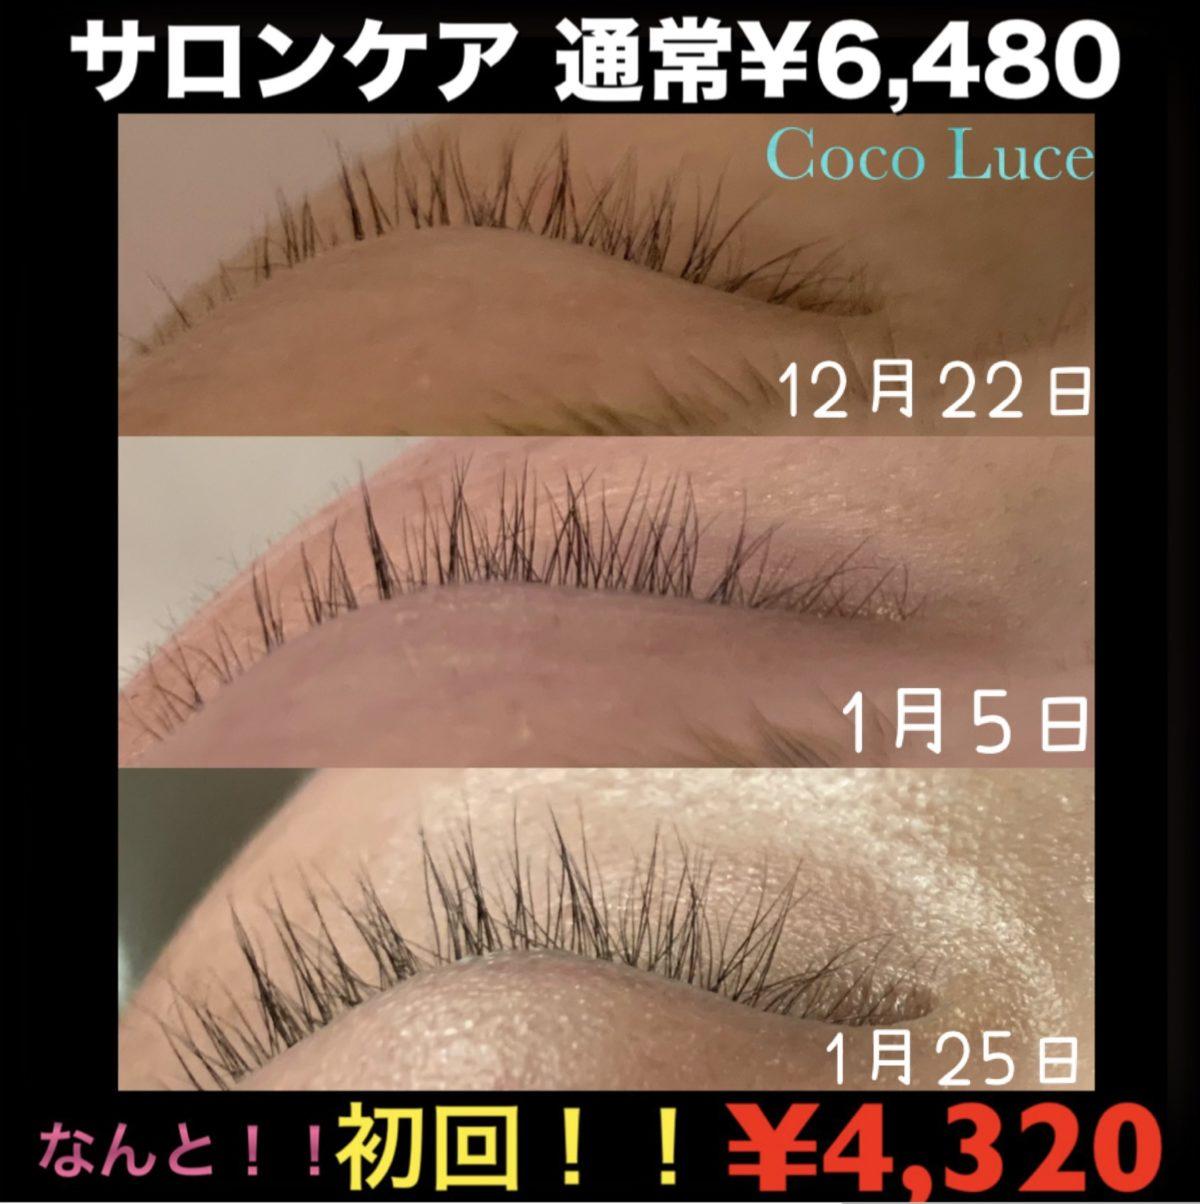 B7EB968A-35CF-4C7C-B836-939E53D8D883